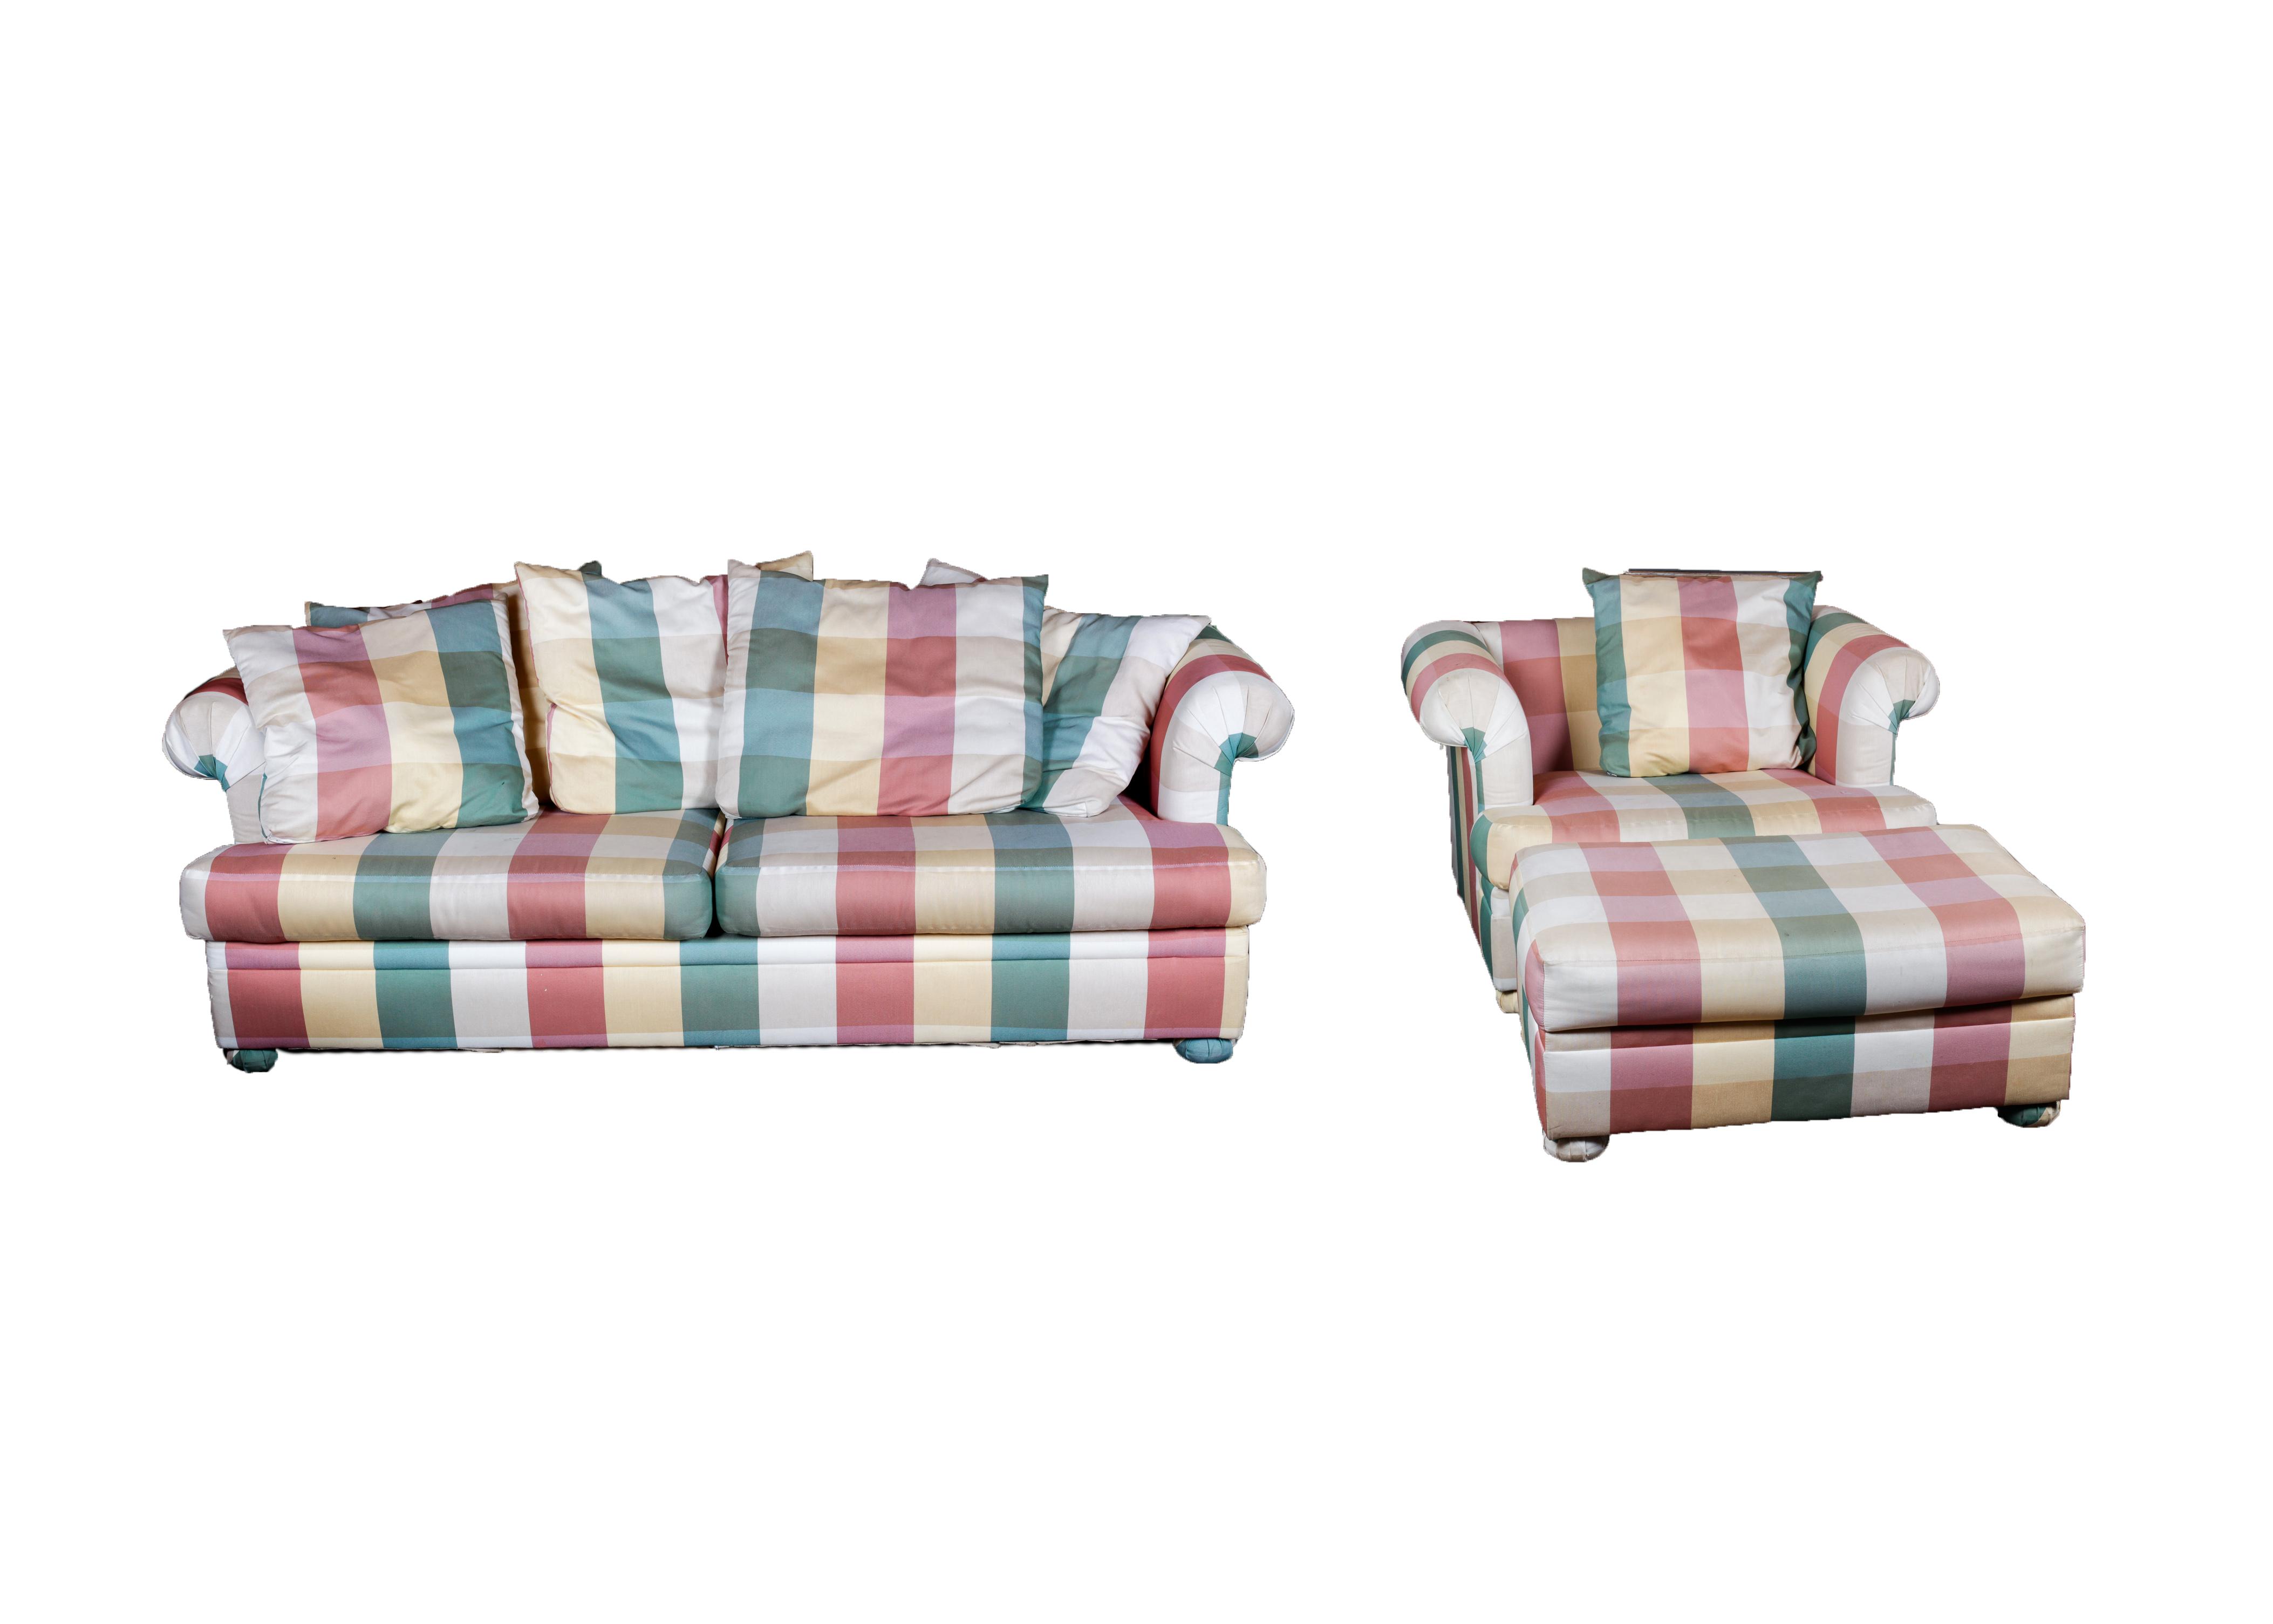 Bauhaus Sleeper Sofa and Chair With Ottoman EBTH